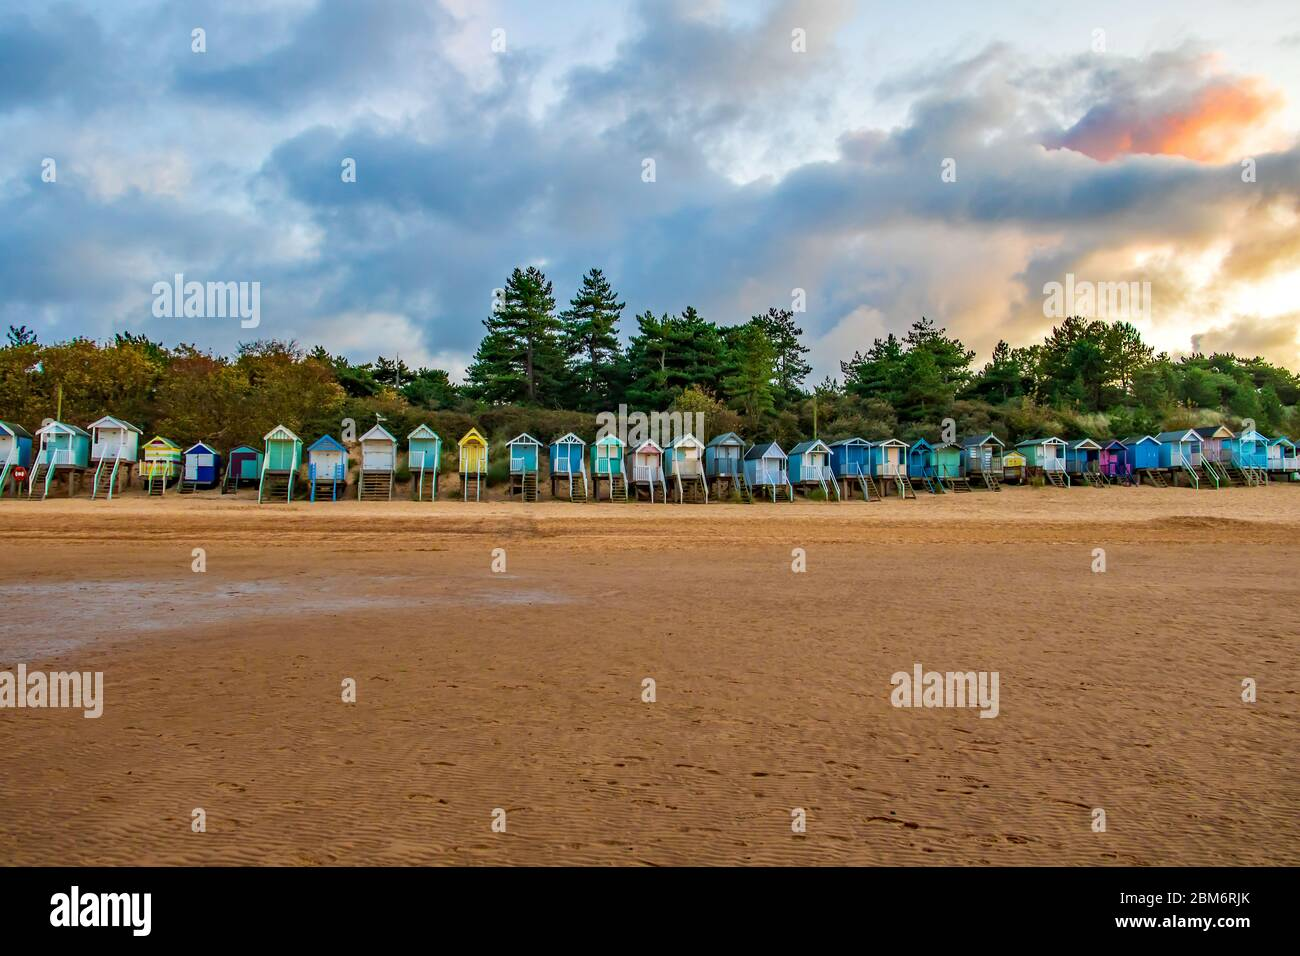 Cabañas de playa en Wells-next-the-sea, Norfolk, Reino Unido, tomadas al atardecer Foto de stock